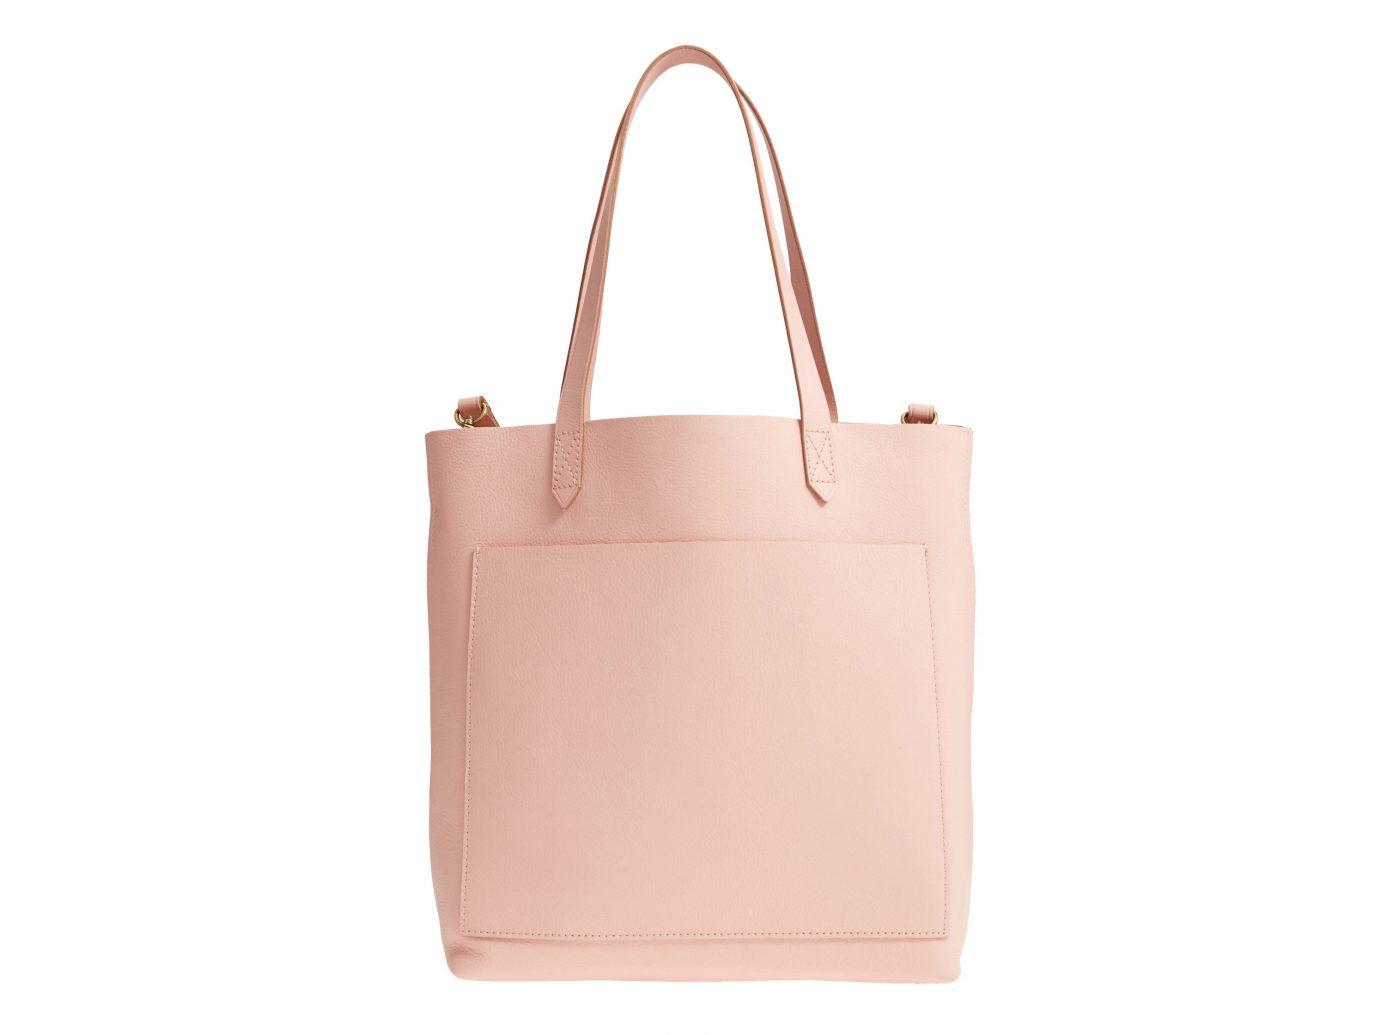 Style + Design Travel Shop white handbag pink bag accessory shoulder bag brown fashion accessory beige product leather peach tote bag case product design caramel color brand